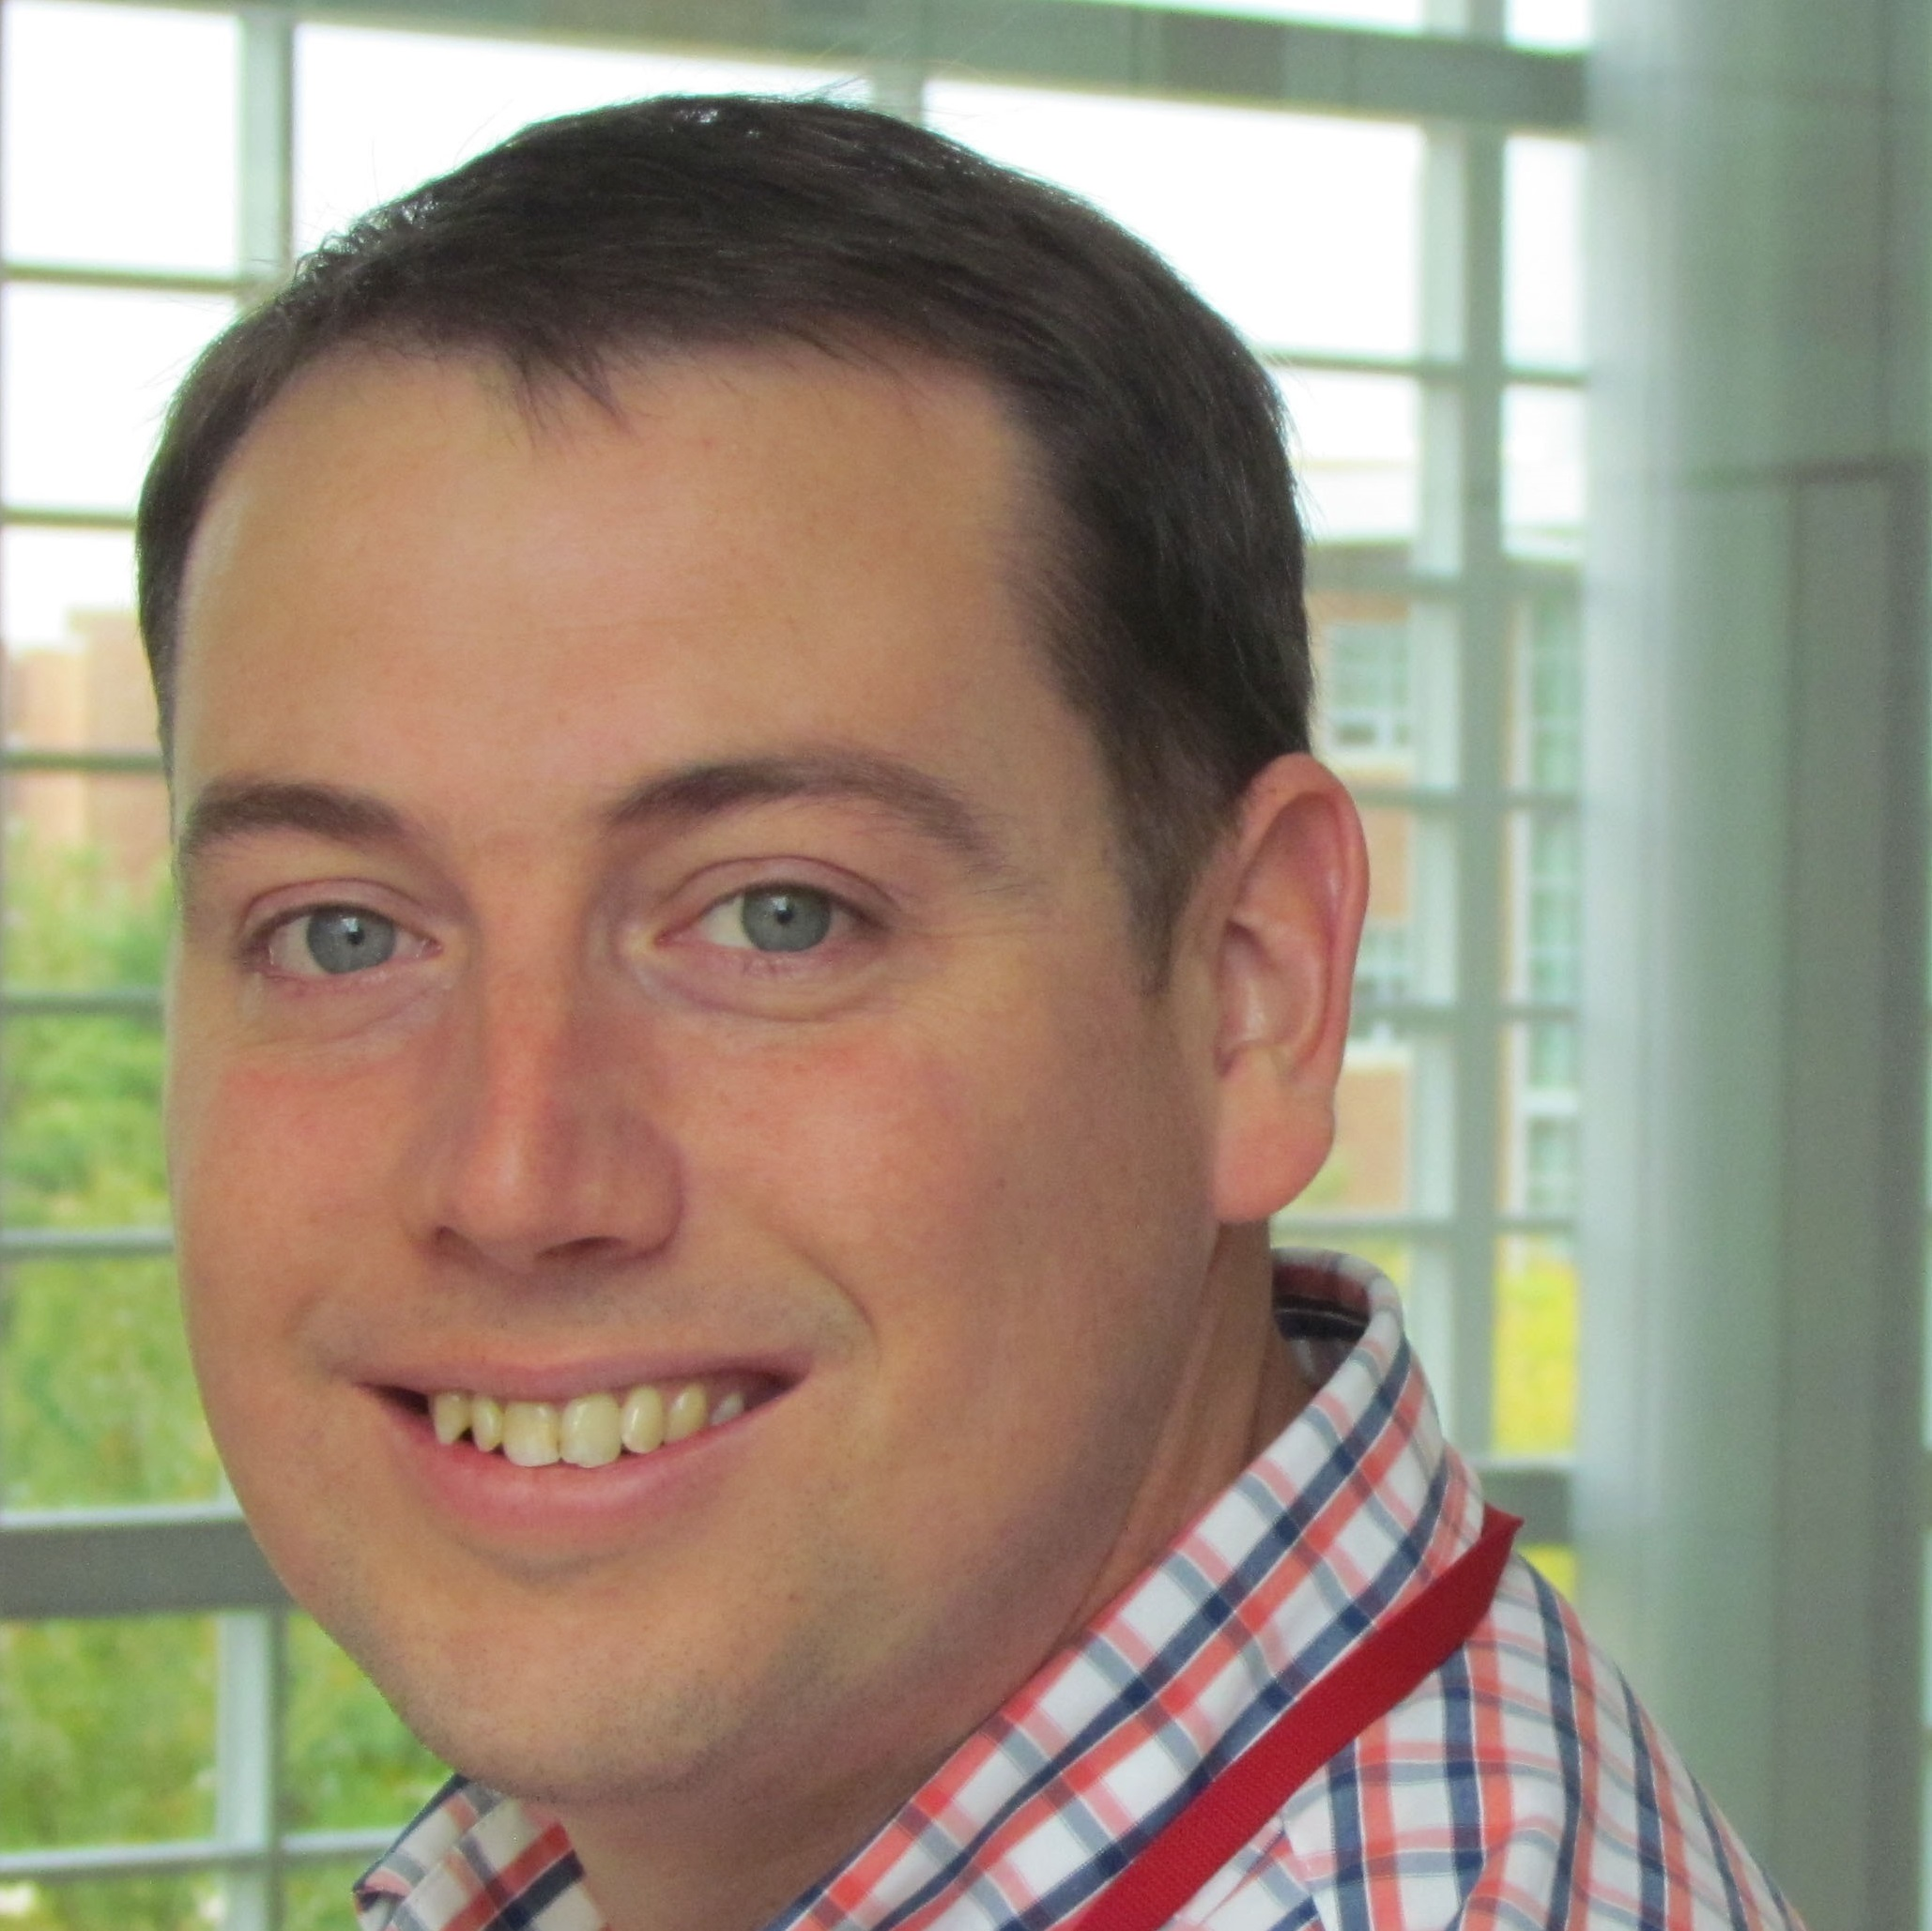 Ryan Gilmore